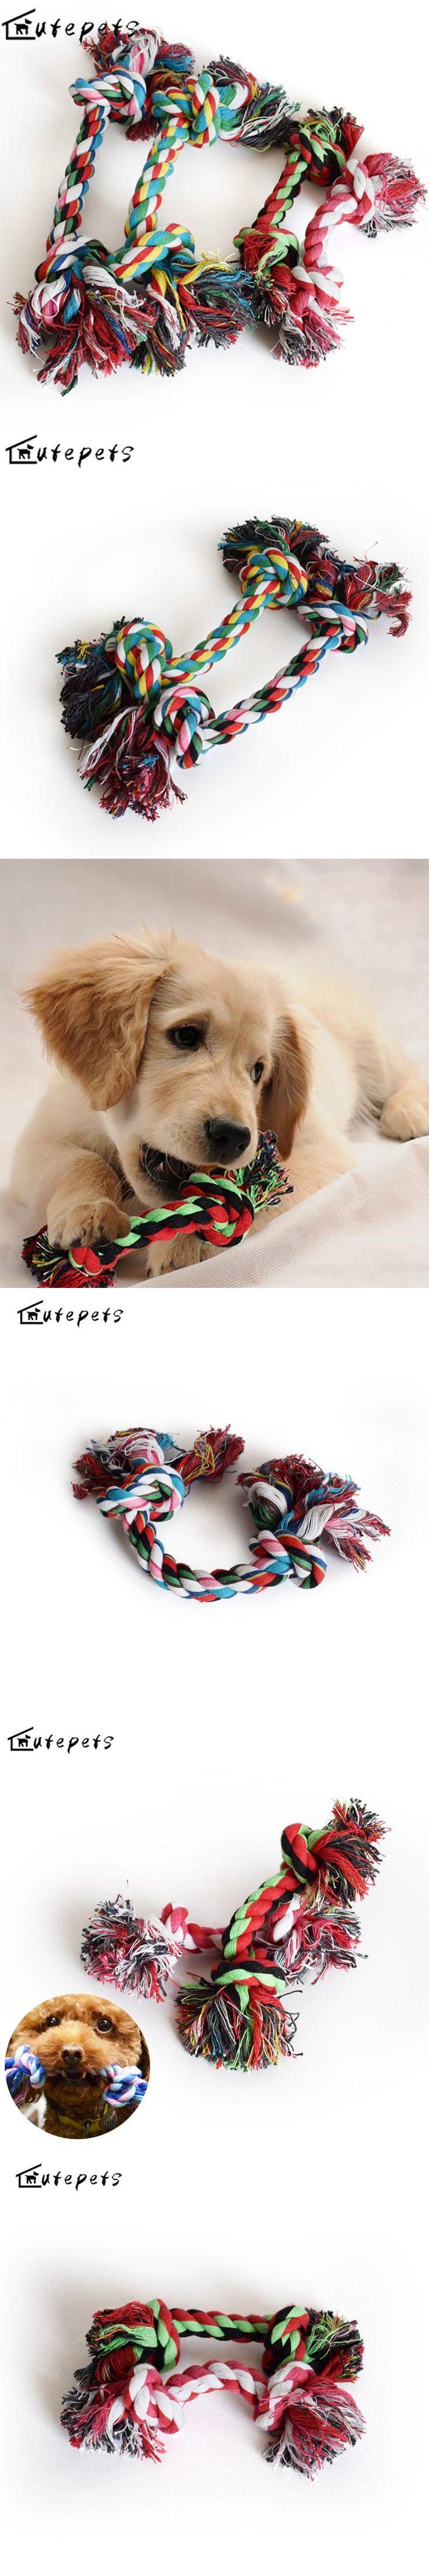 Best 25 Dog chew bones ideas on Pinterest